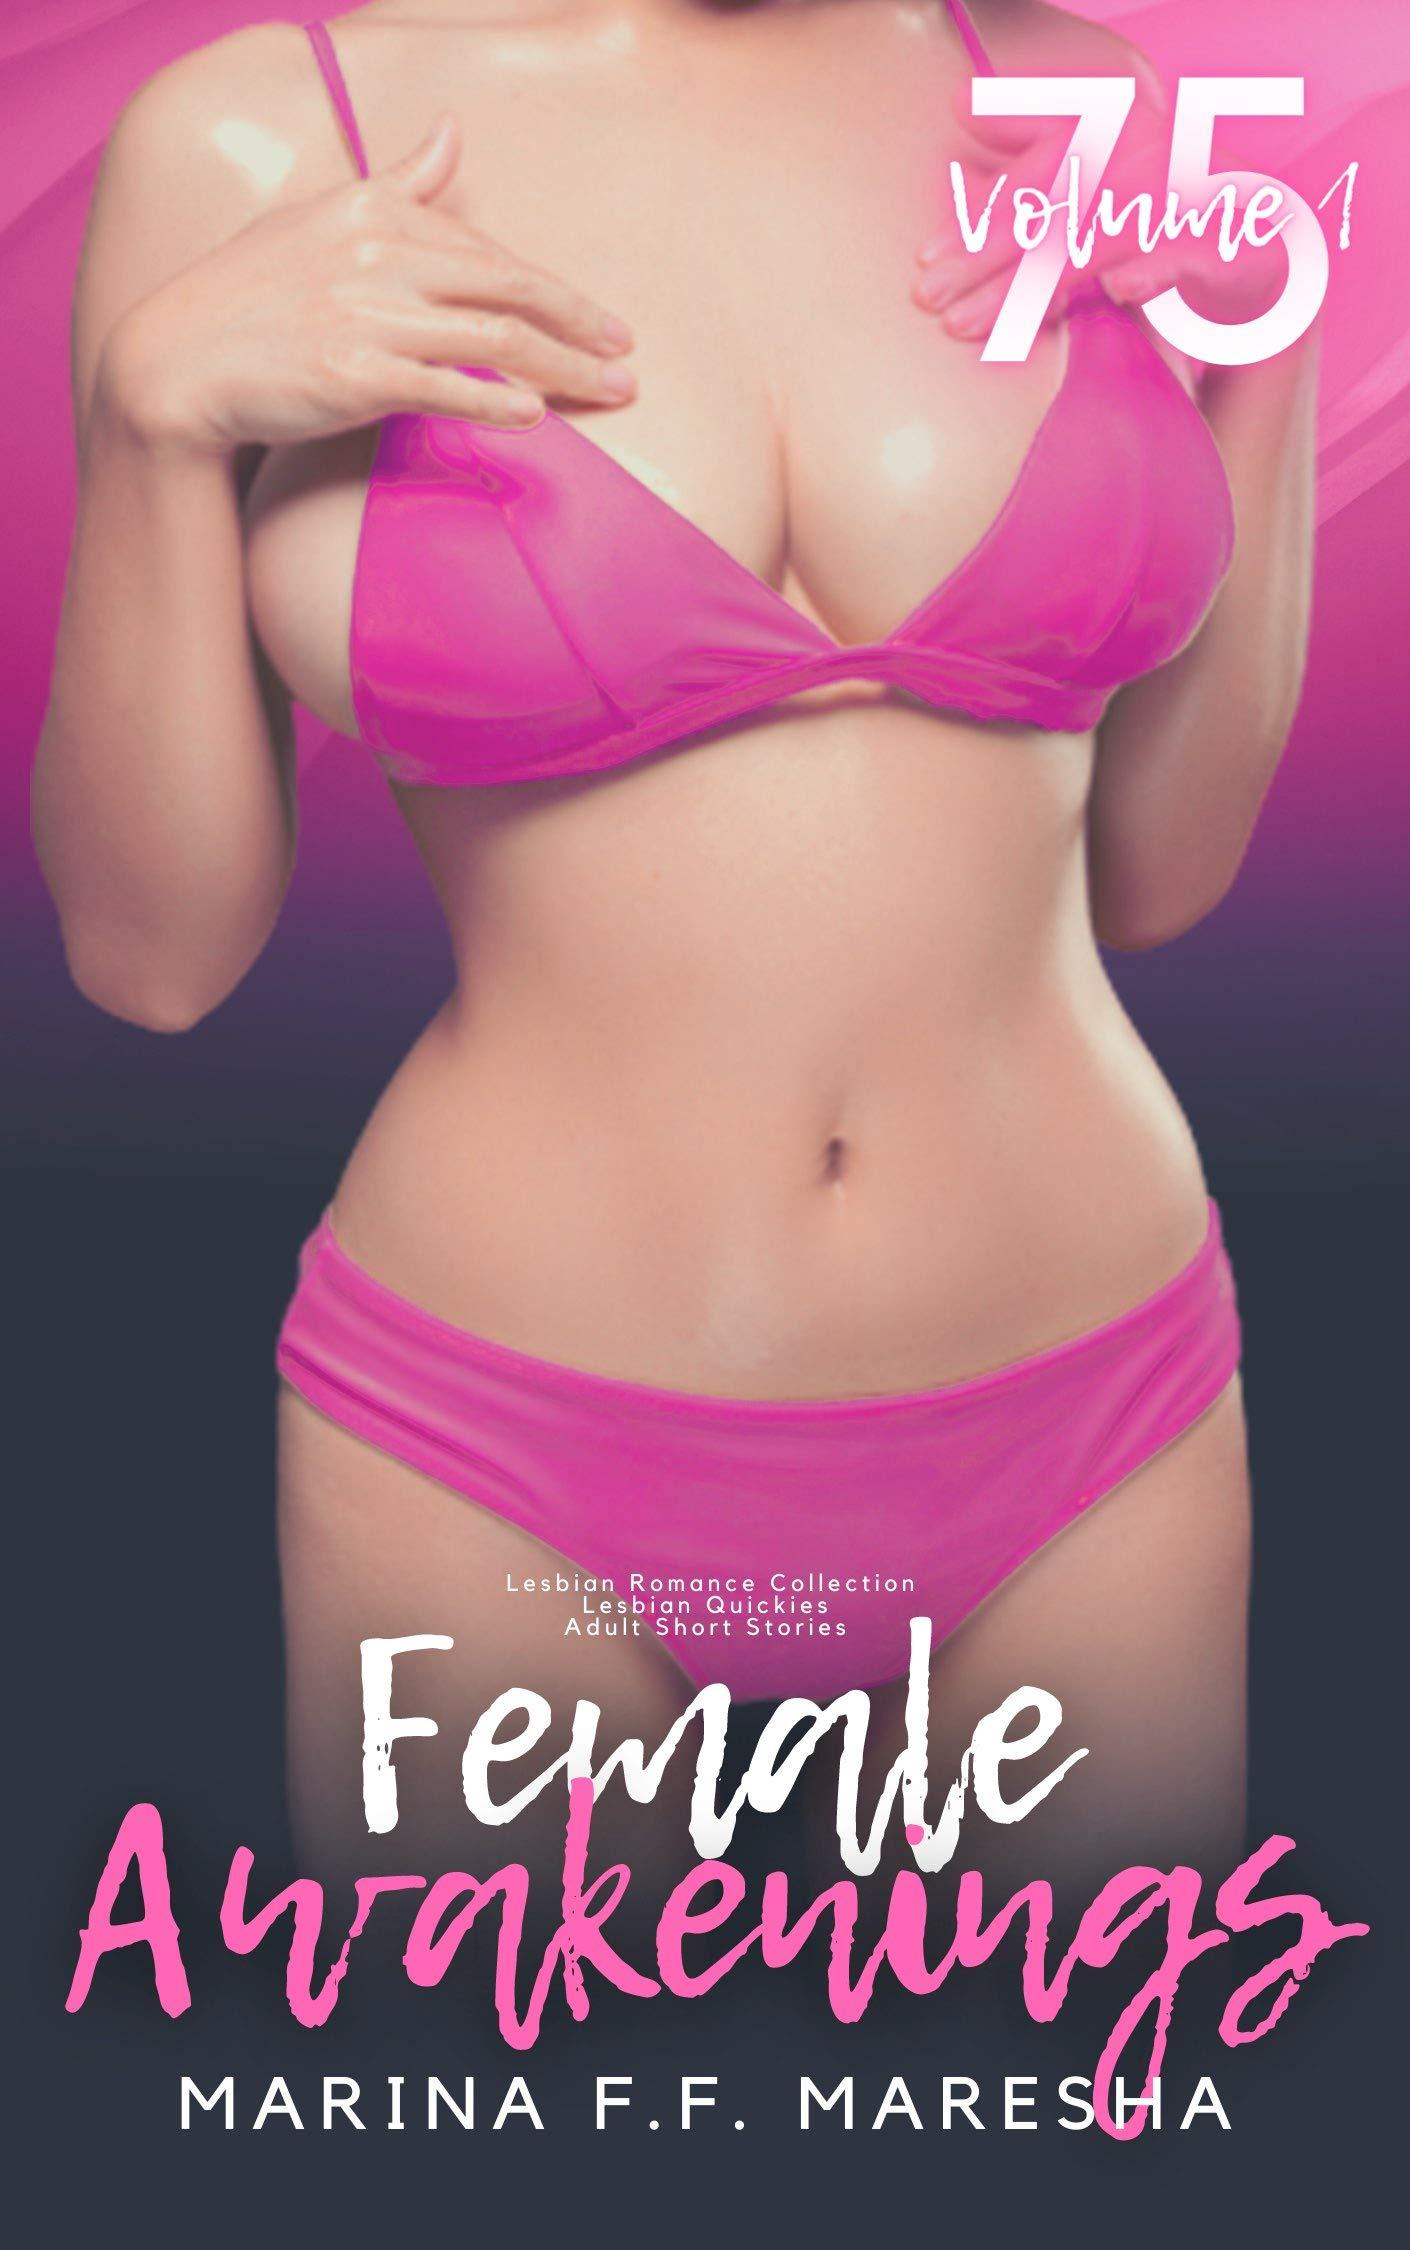 Female Awakenings: Lesbian Romance Collection - Volume 1: 75 Lesbian Quickies: Adult Short Stories